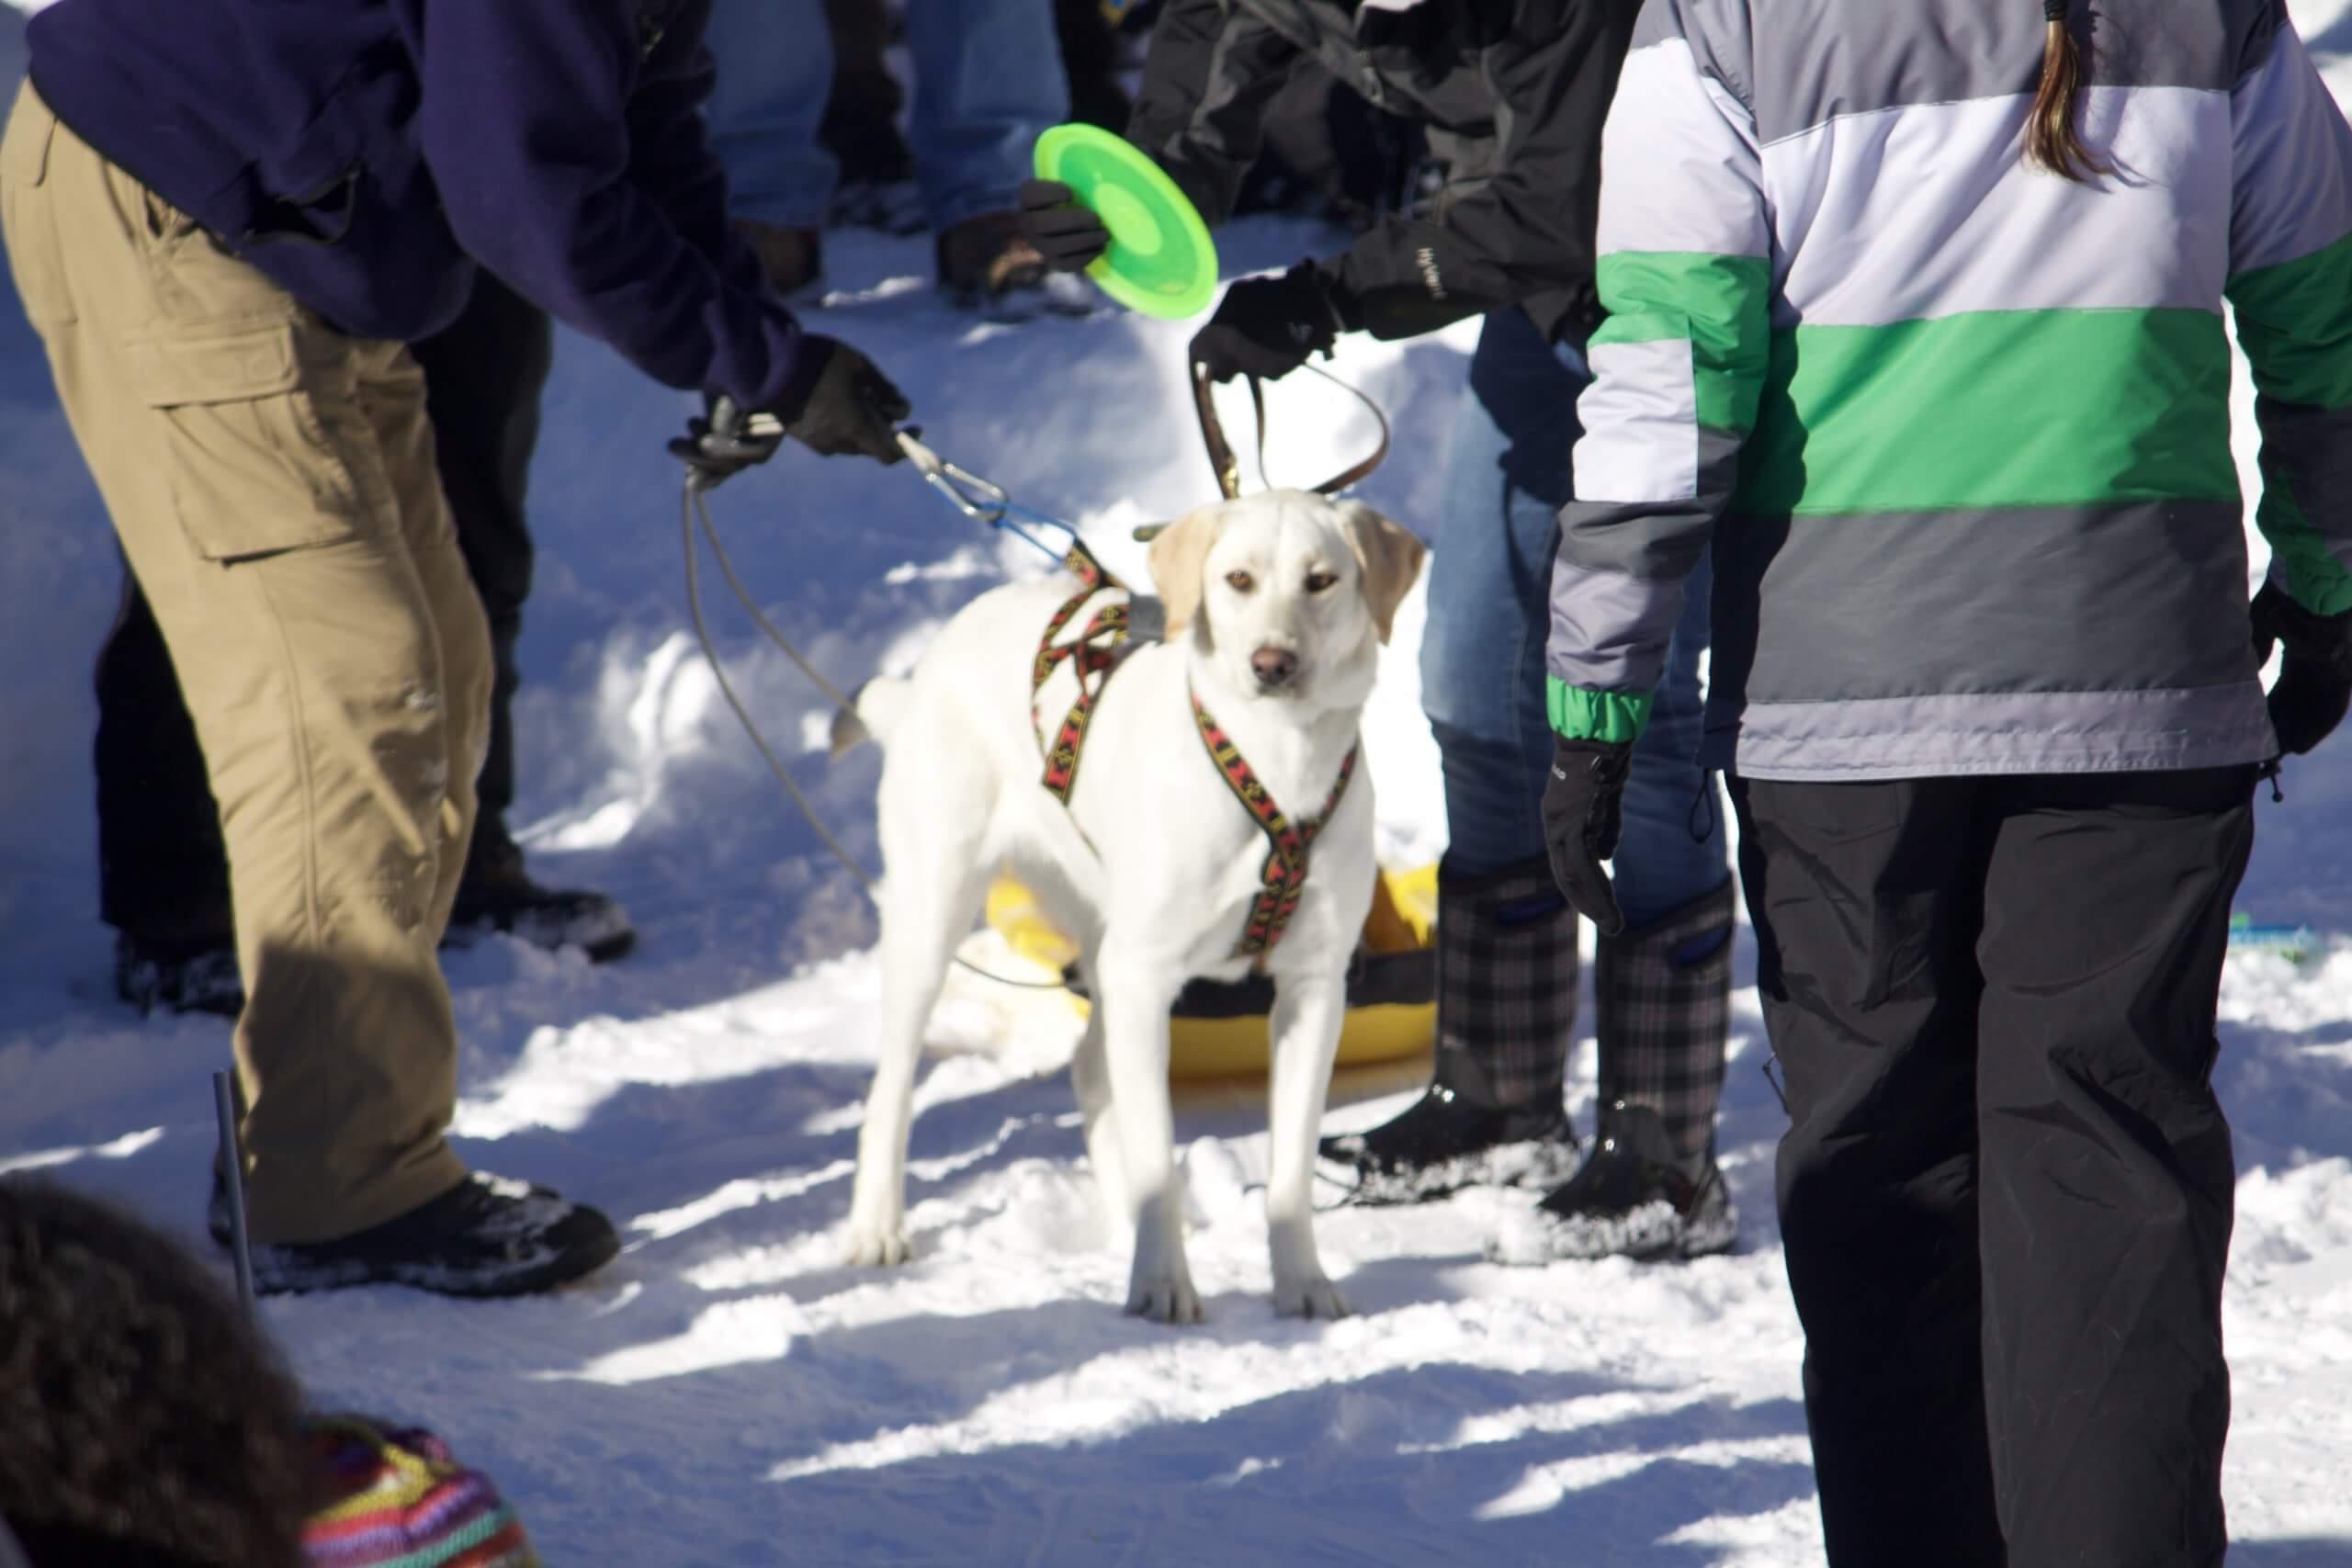 A dog pulling a sled.